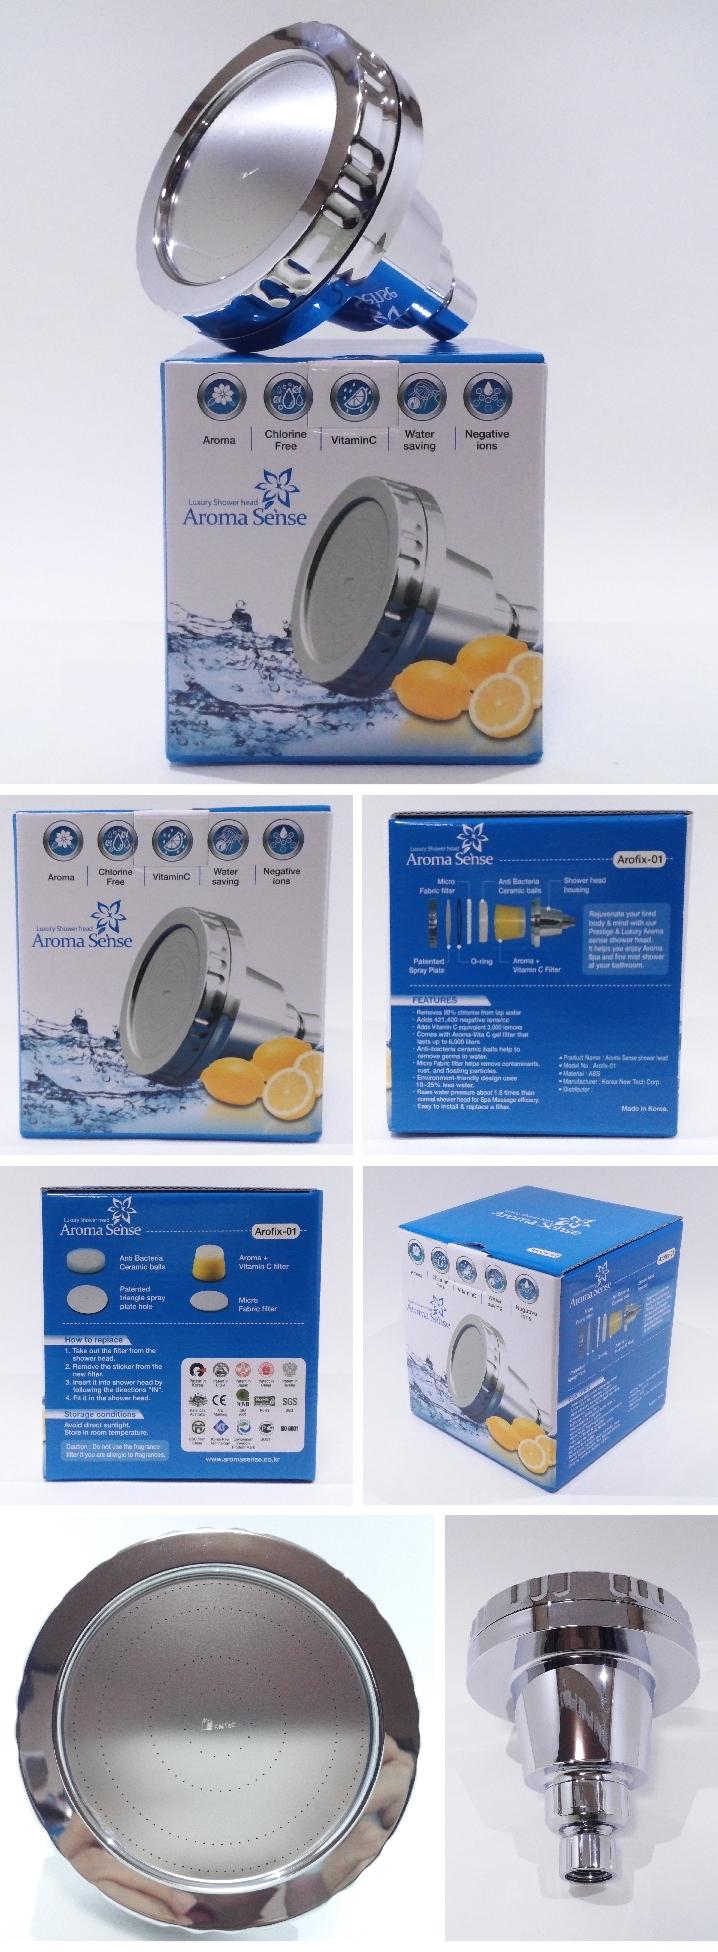 kntec aroma sense vitamin c water saving super jet arofix 01 fixed shower head ebay. Black Bedroom Furniture Sets. Home Design Ideas